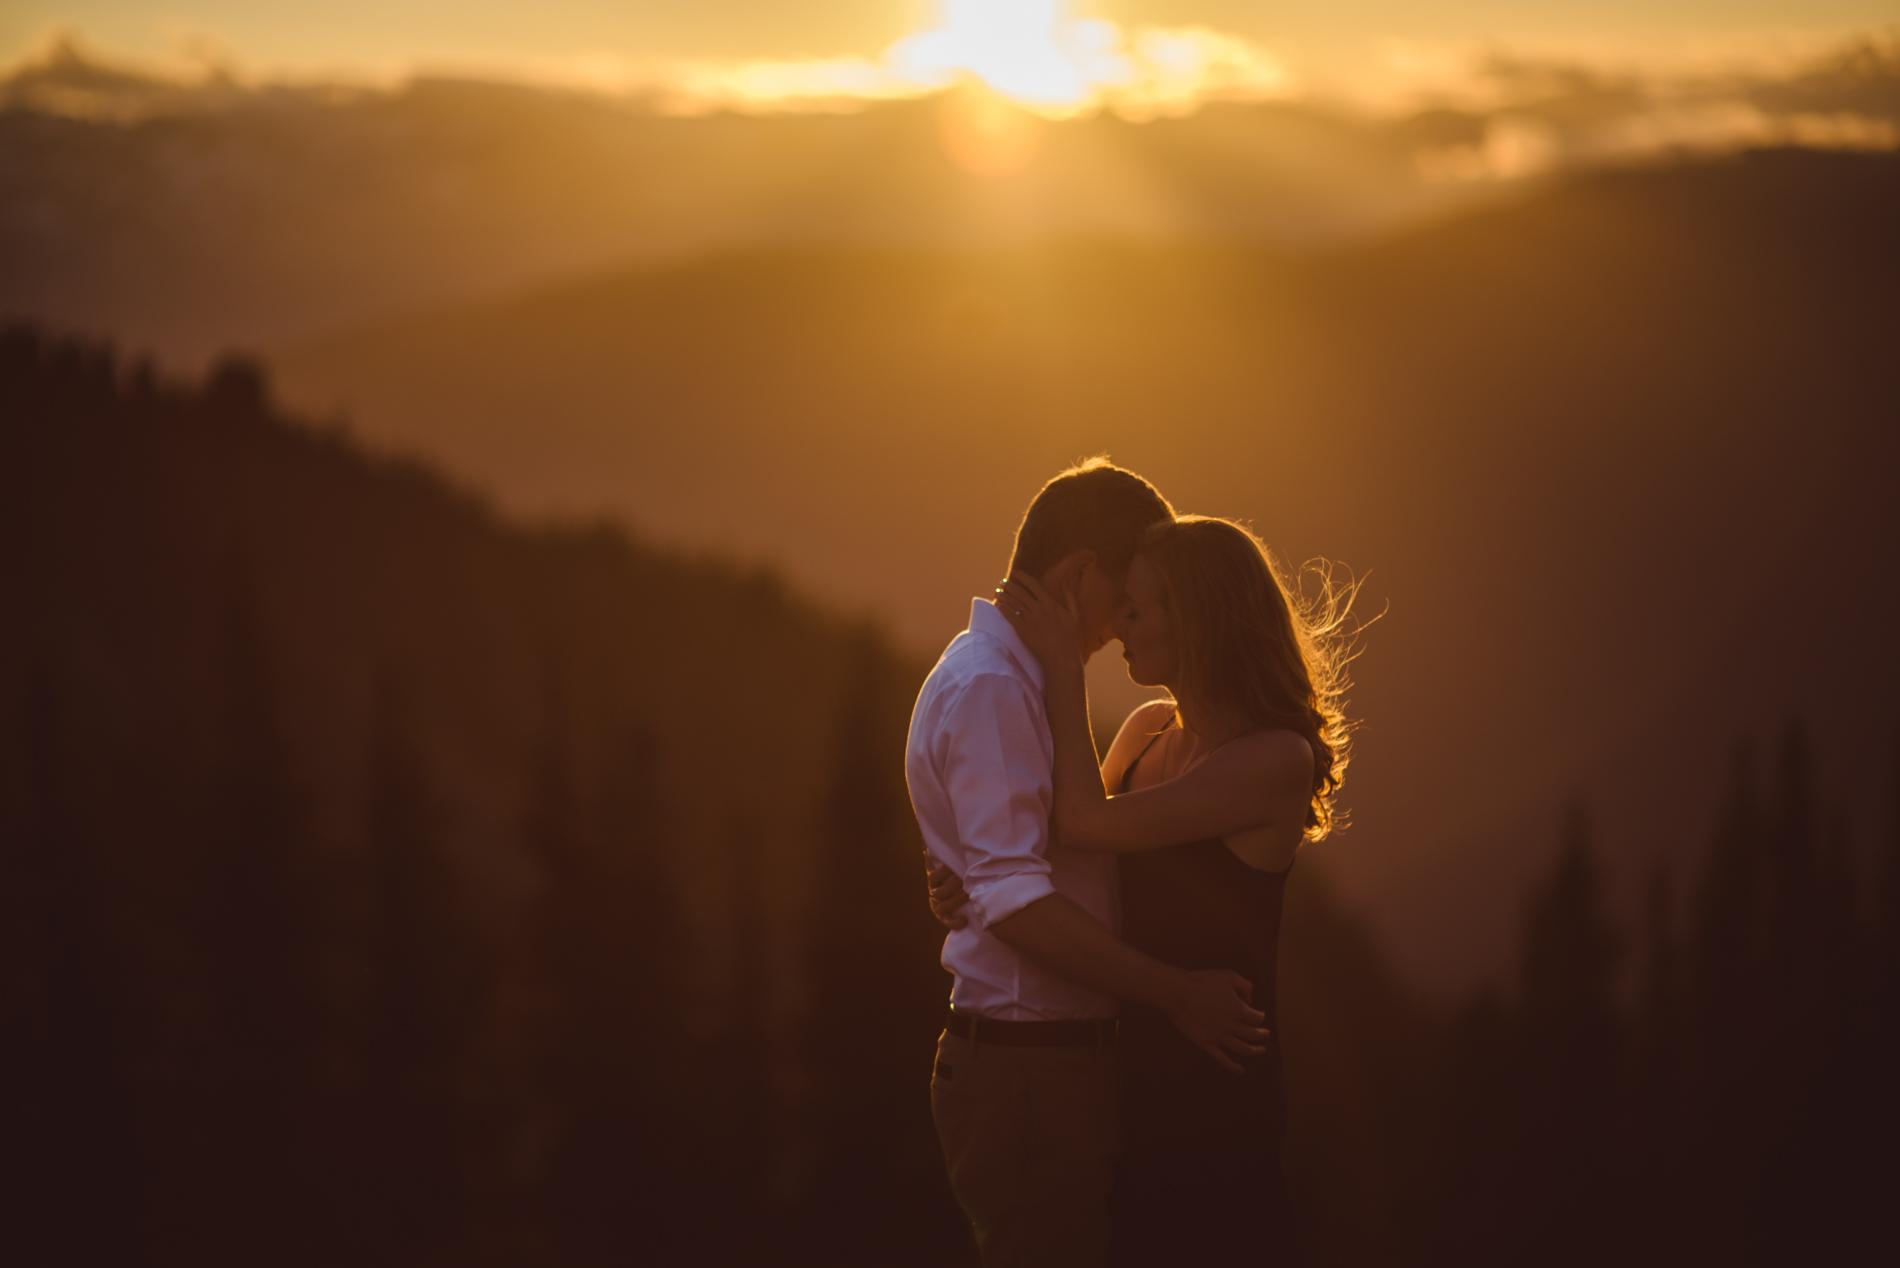 whistler-engagement-photography-sunset_001